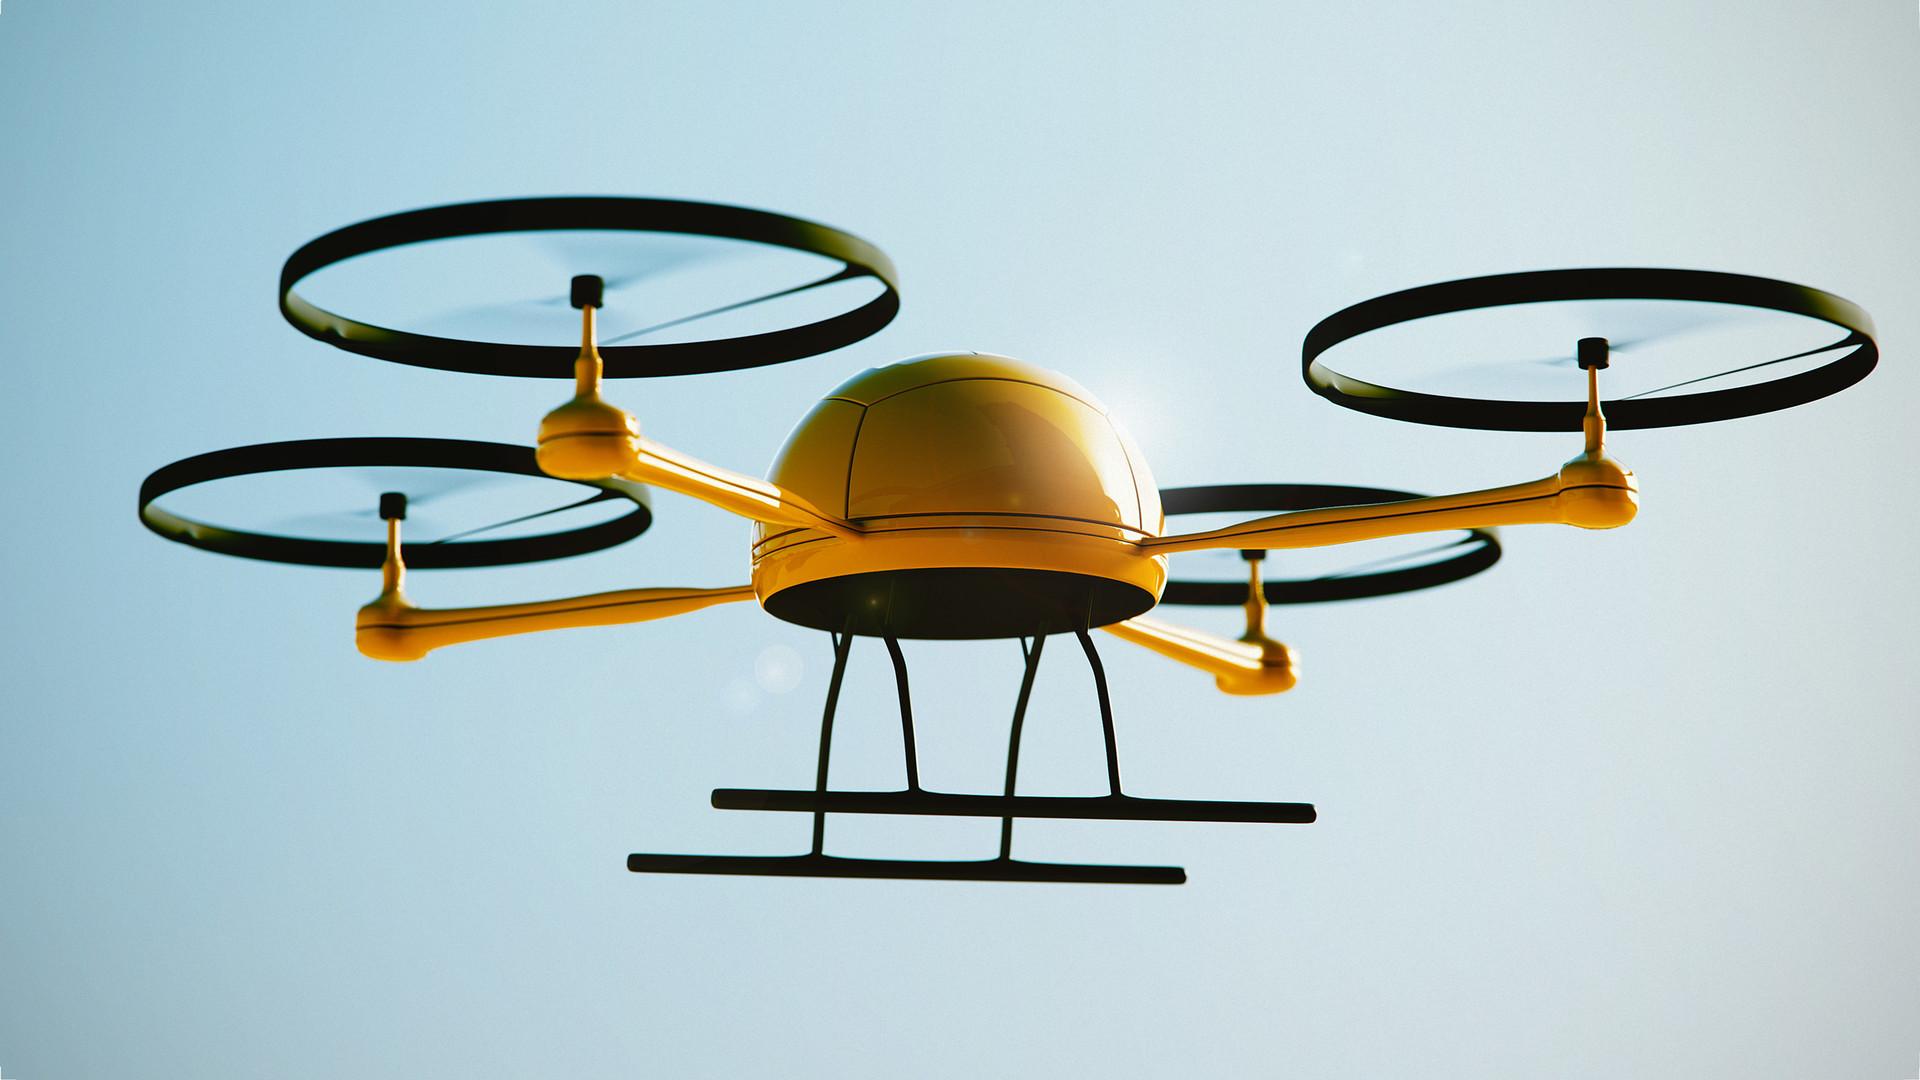 Chris ebbinger drone0